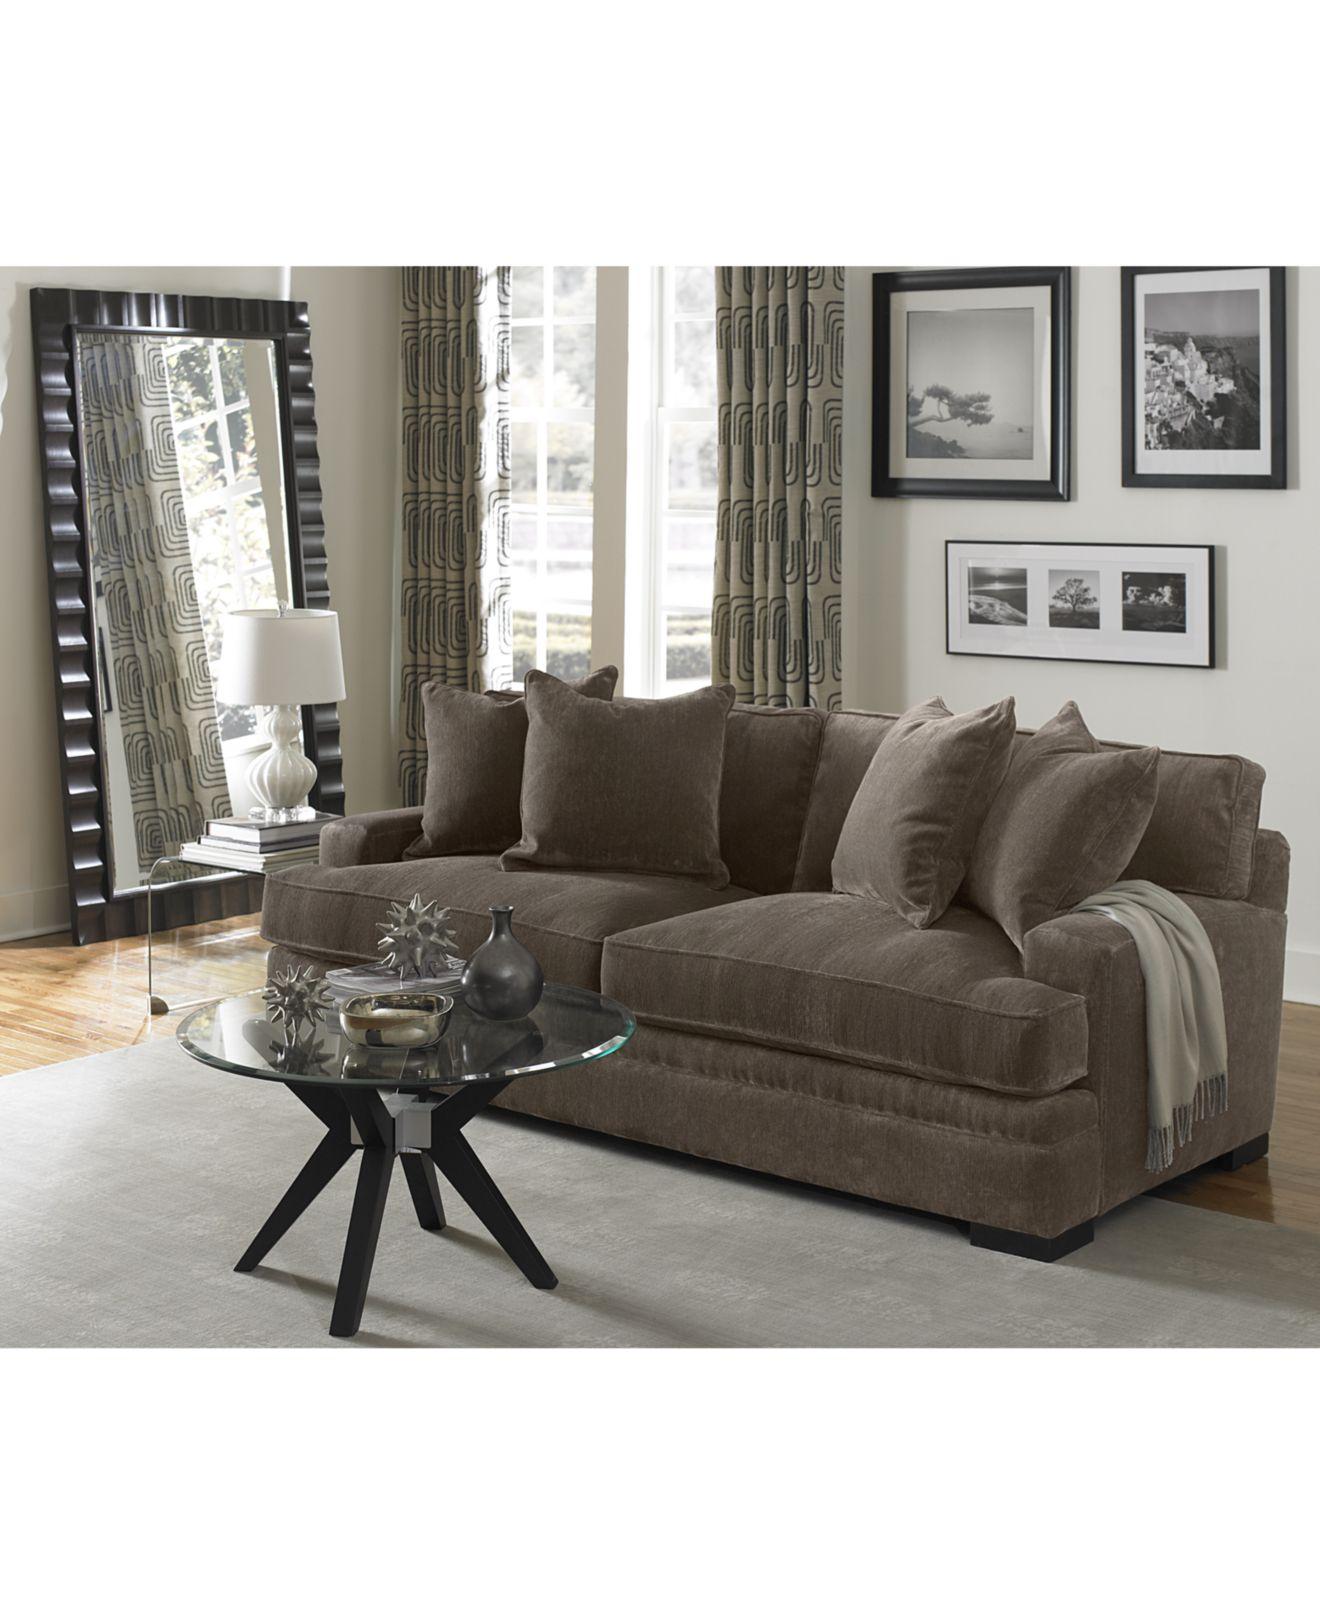 living room furniture sets - macy's